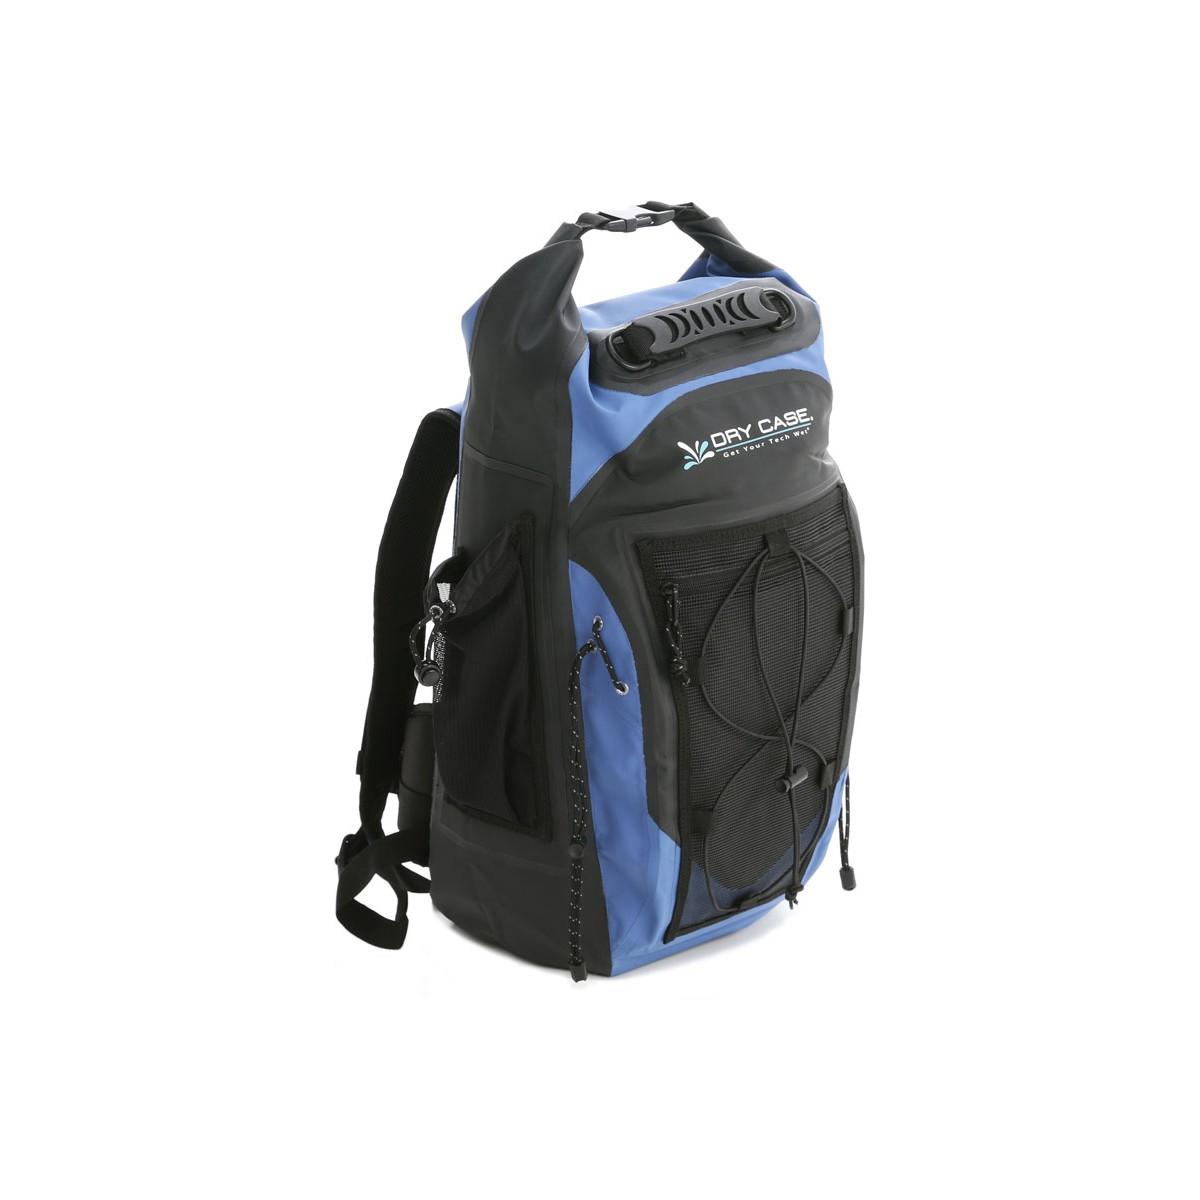 90b595d55b Drycase Masonboro Waterproof Backpack - Islanddivers.com